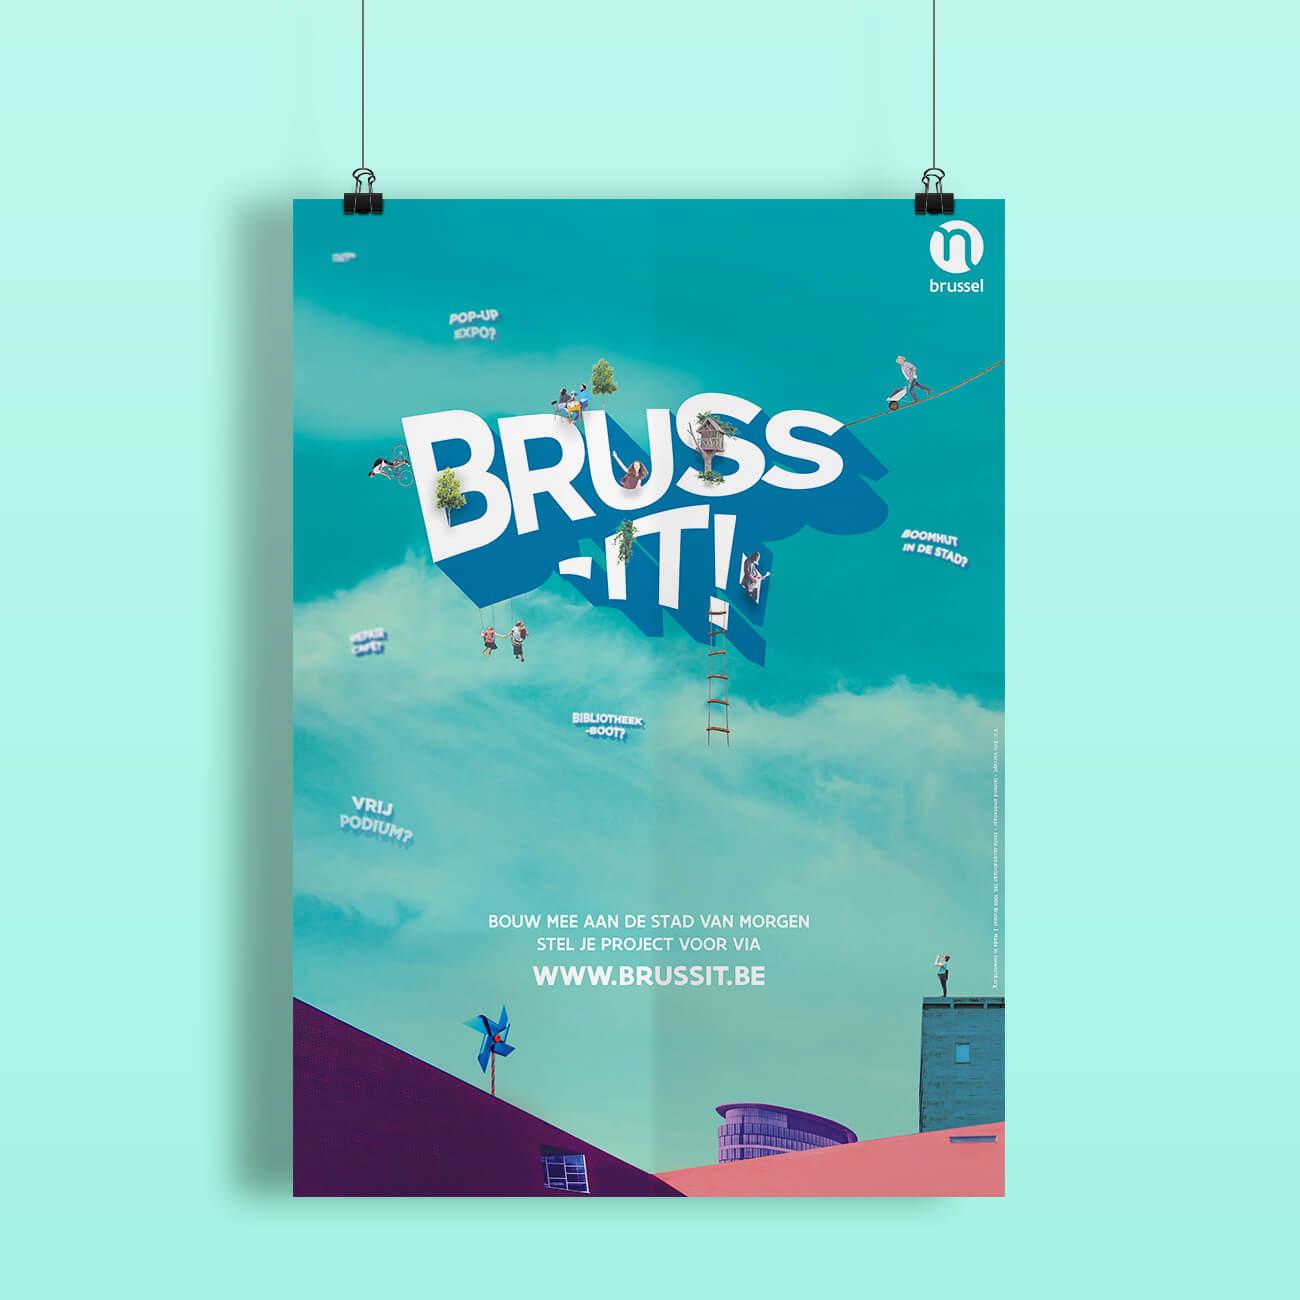 bruss-it-mock-up-affiche